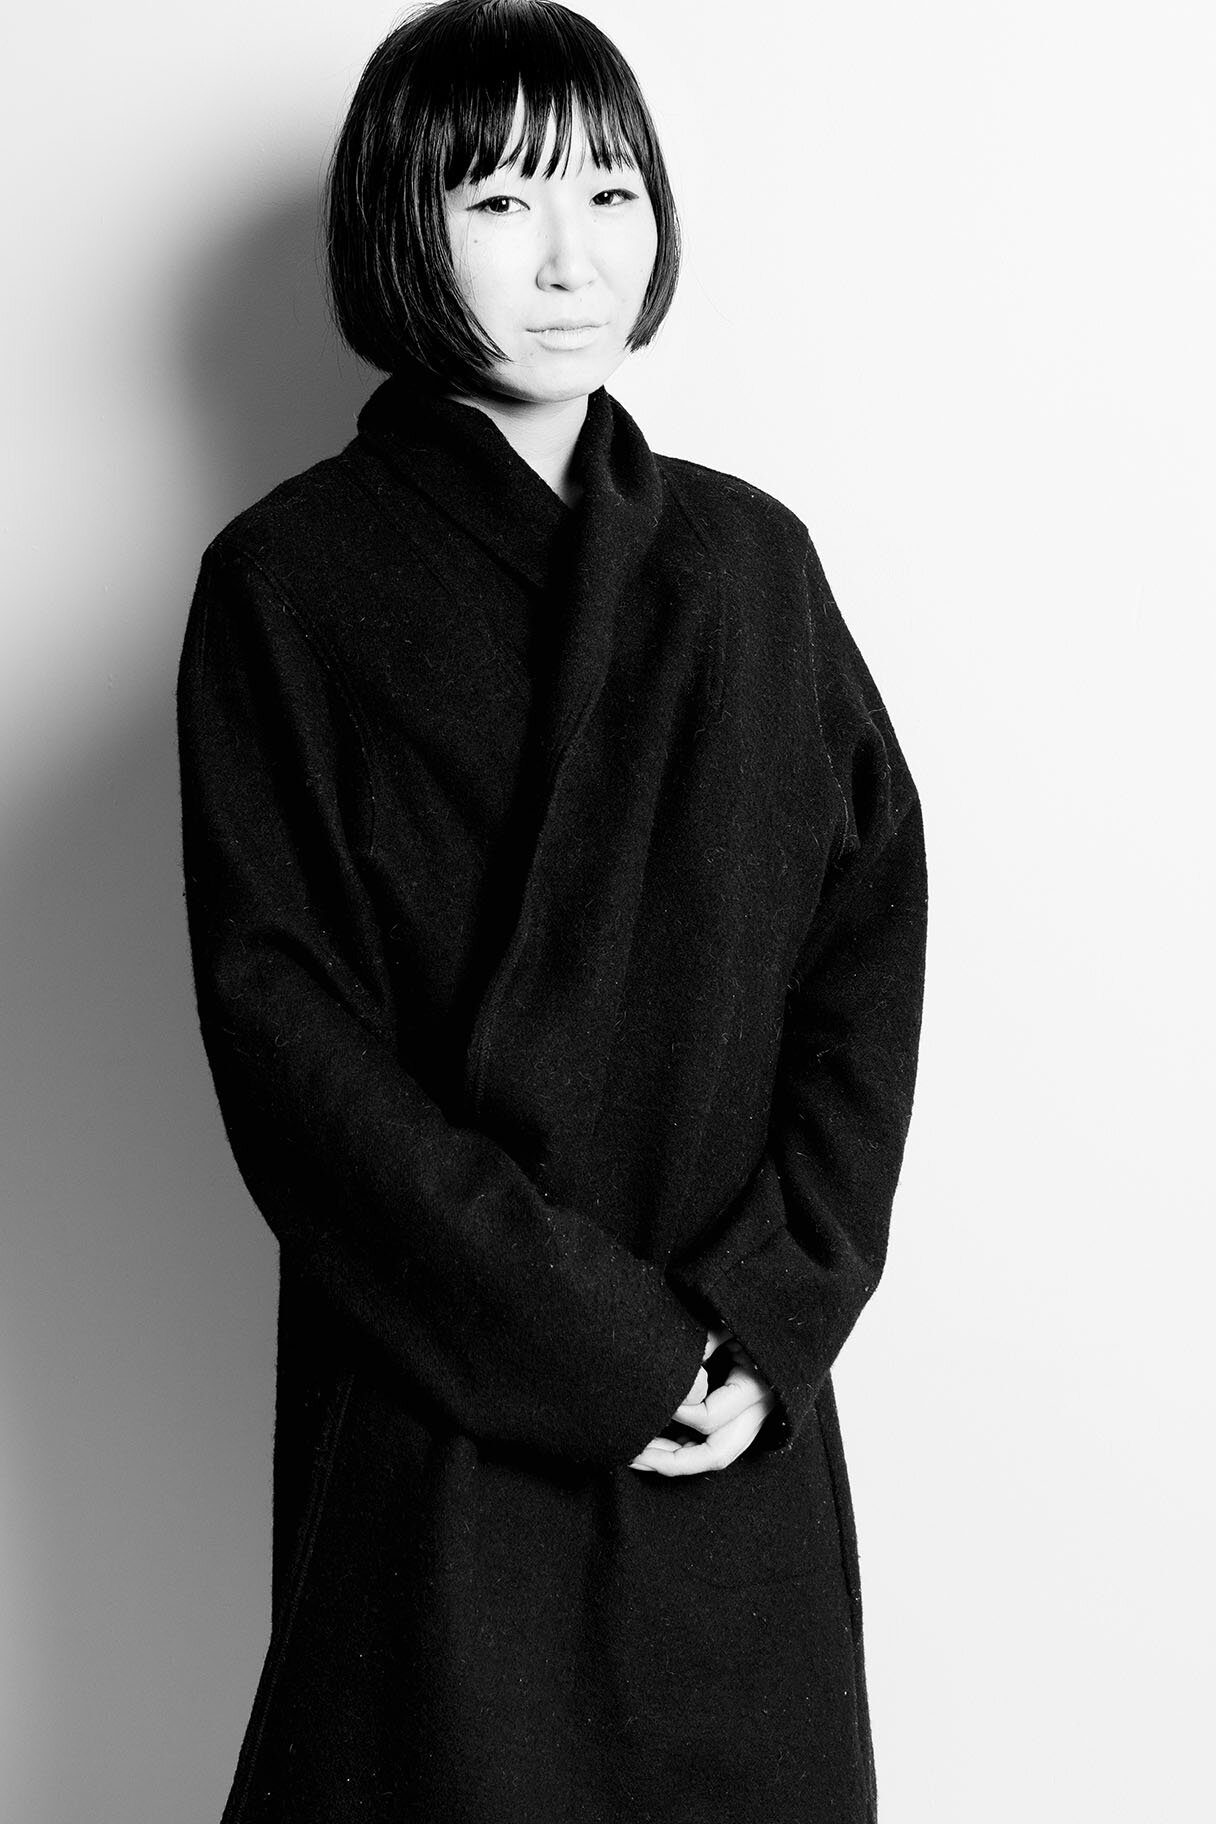 aya-takano-artist-new-york-perrotin-guillaume-ziccarelli-02.jpg